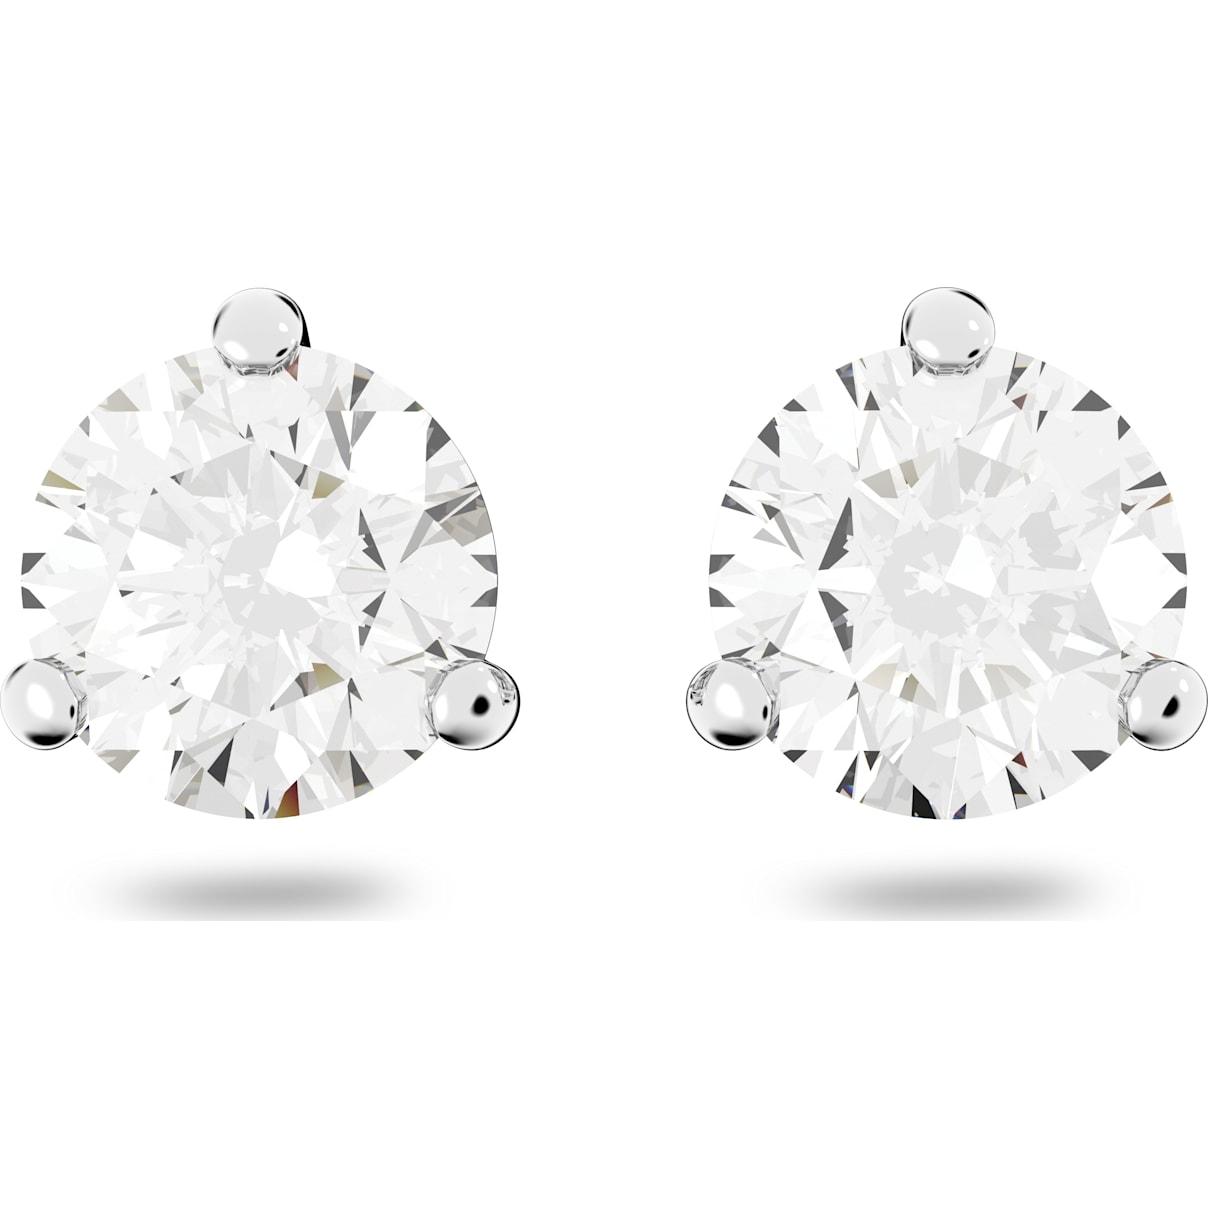 Swarovski Solitaire Pierced Earrings, White, Rhodium plated